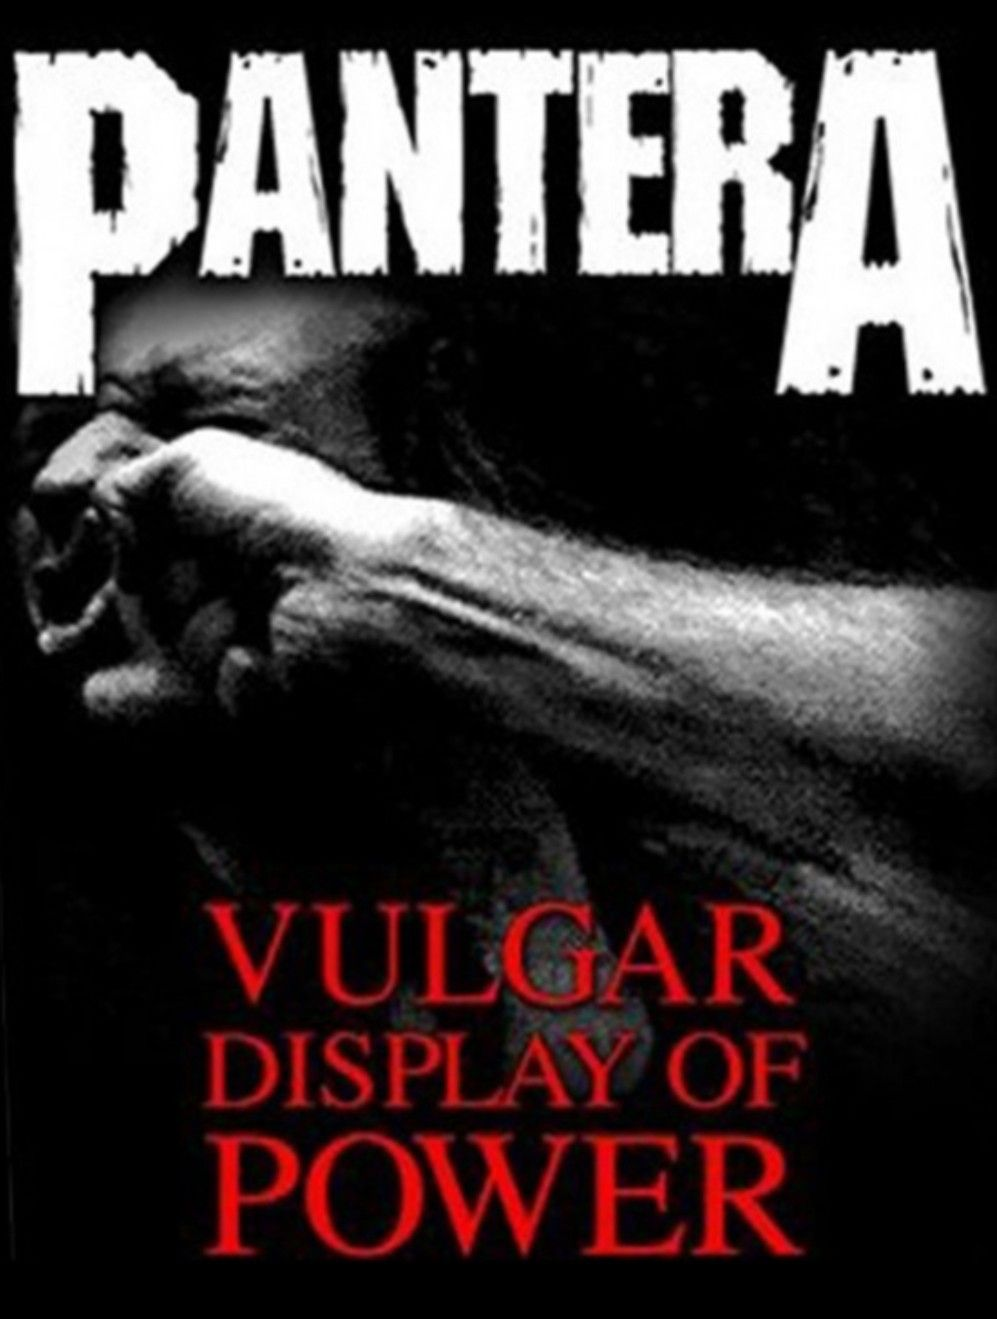 Pantera Vulgar Display of Power Thrash Metal Licensed Tee T-Shirt Men